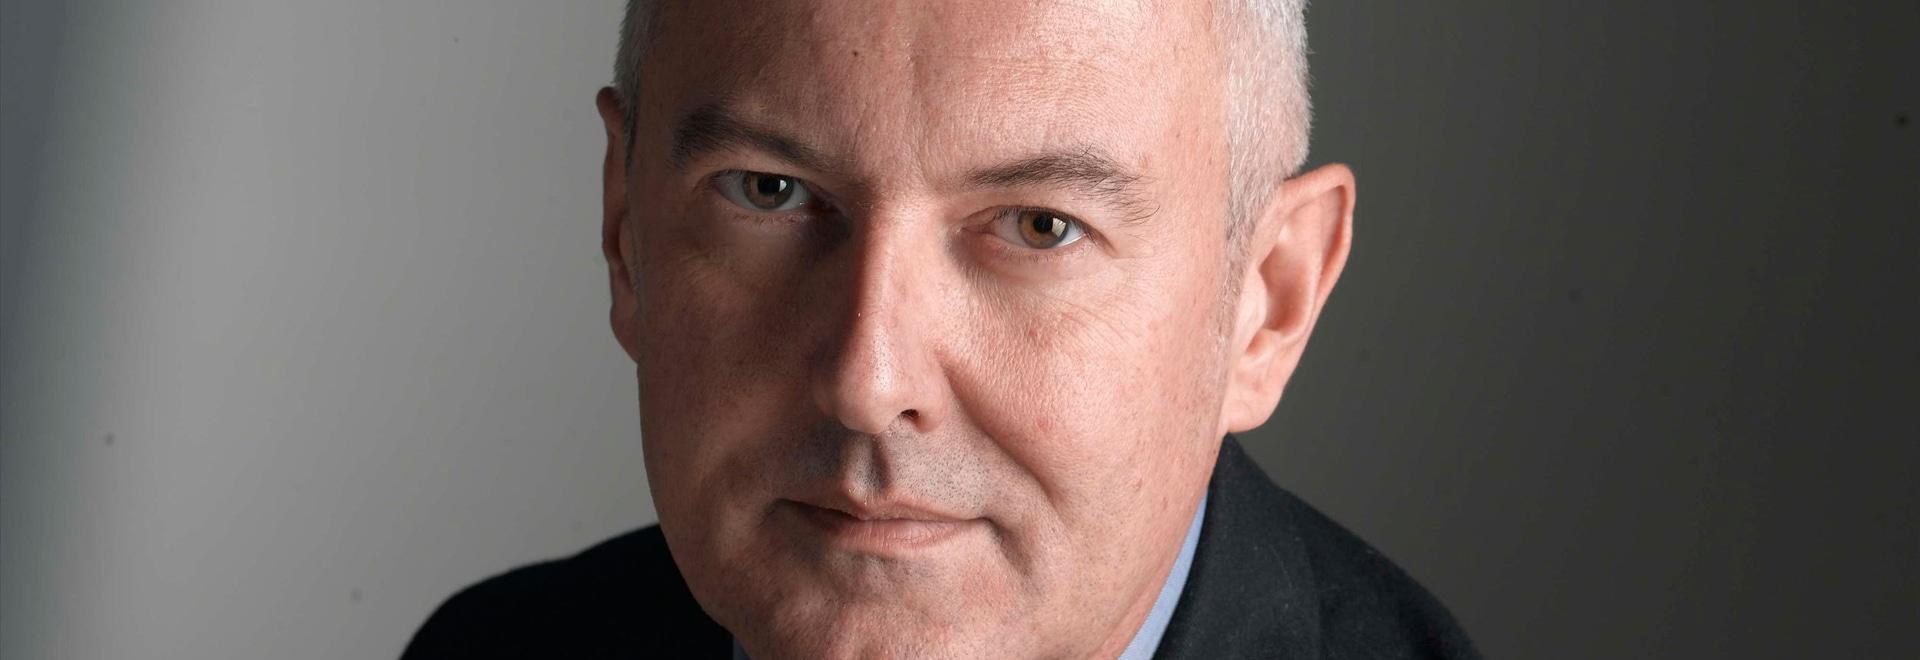 Claudio Martinolli, new Marketing Manager of Samo Industries Group